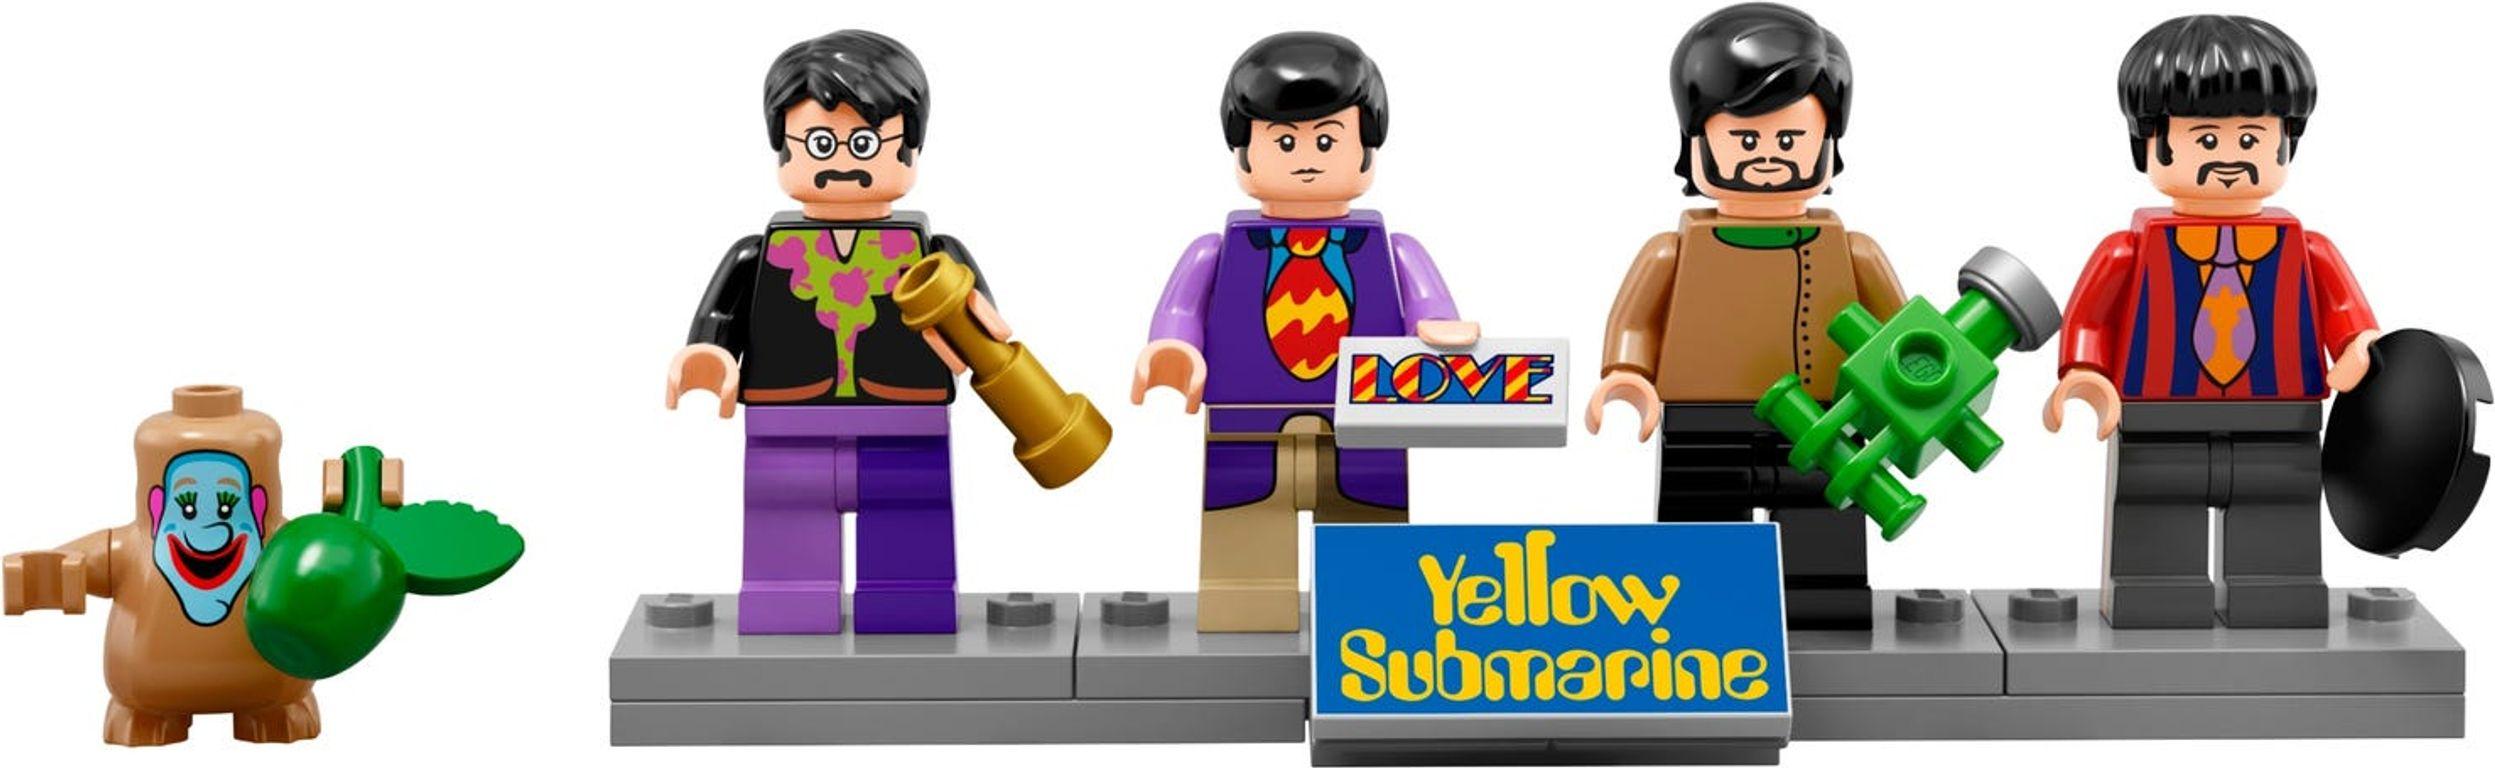 Yellow Submarine minifigures